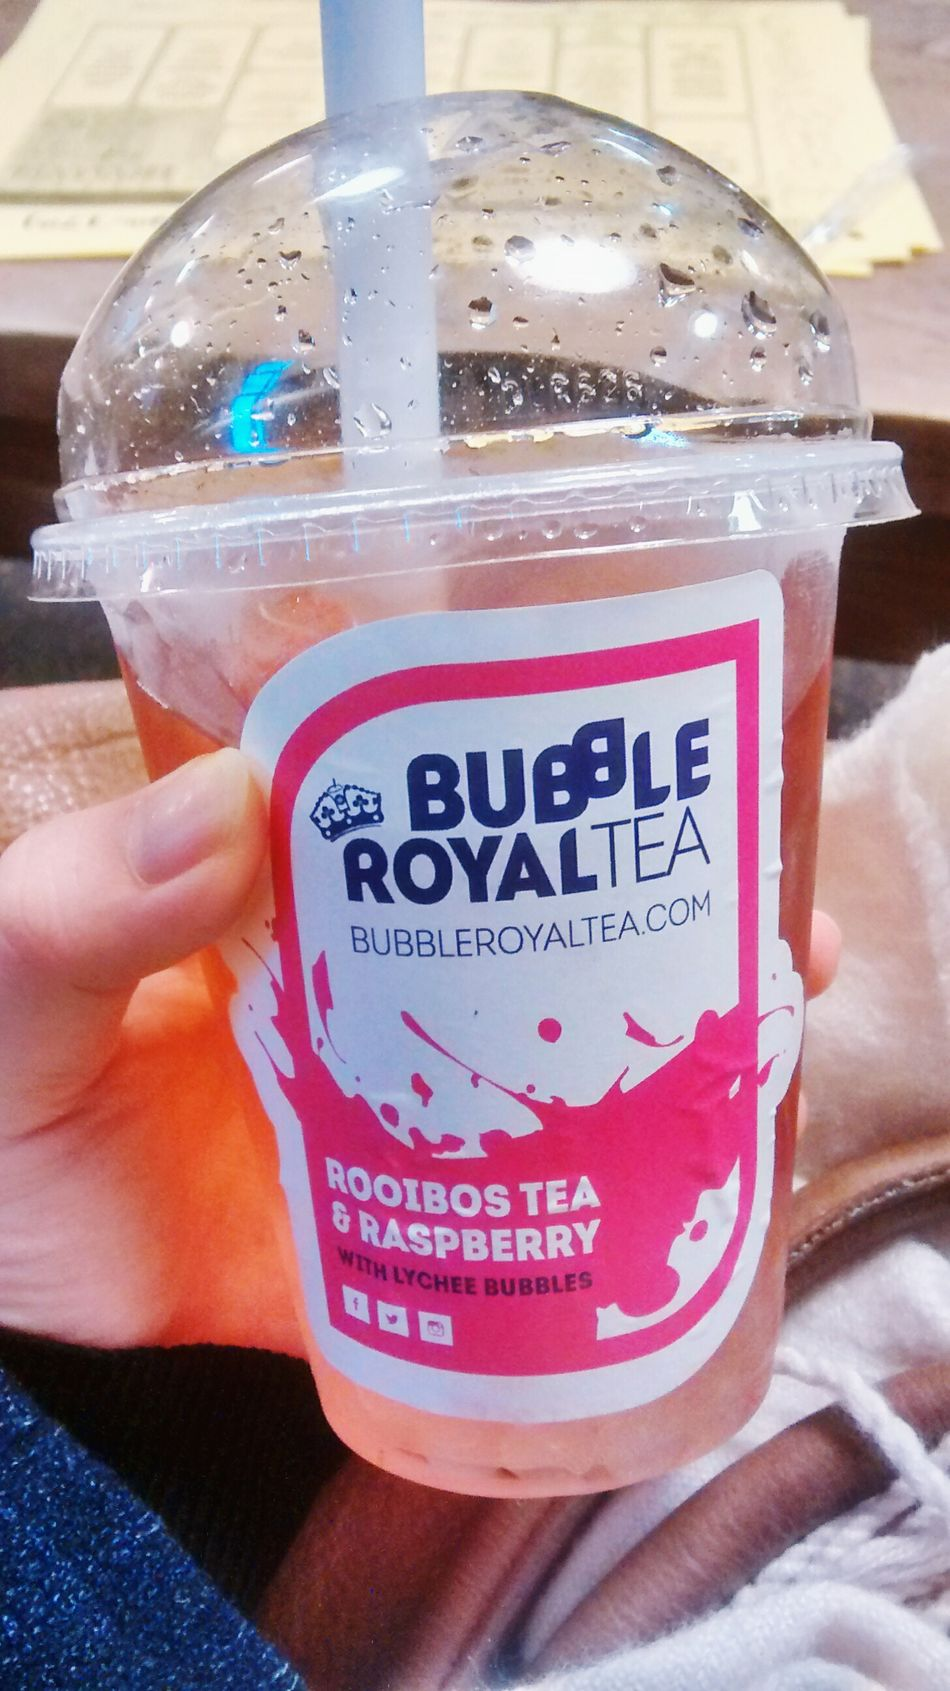 The bubble tea is back! ??